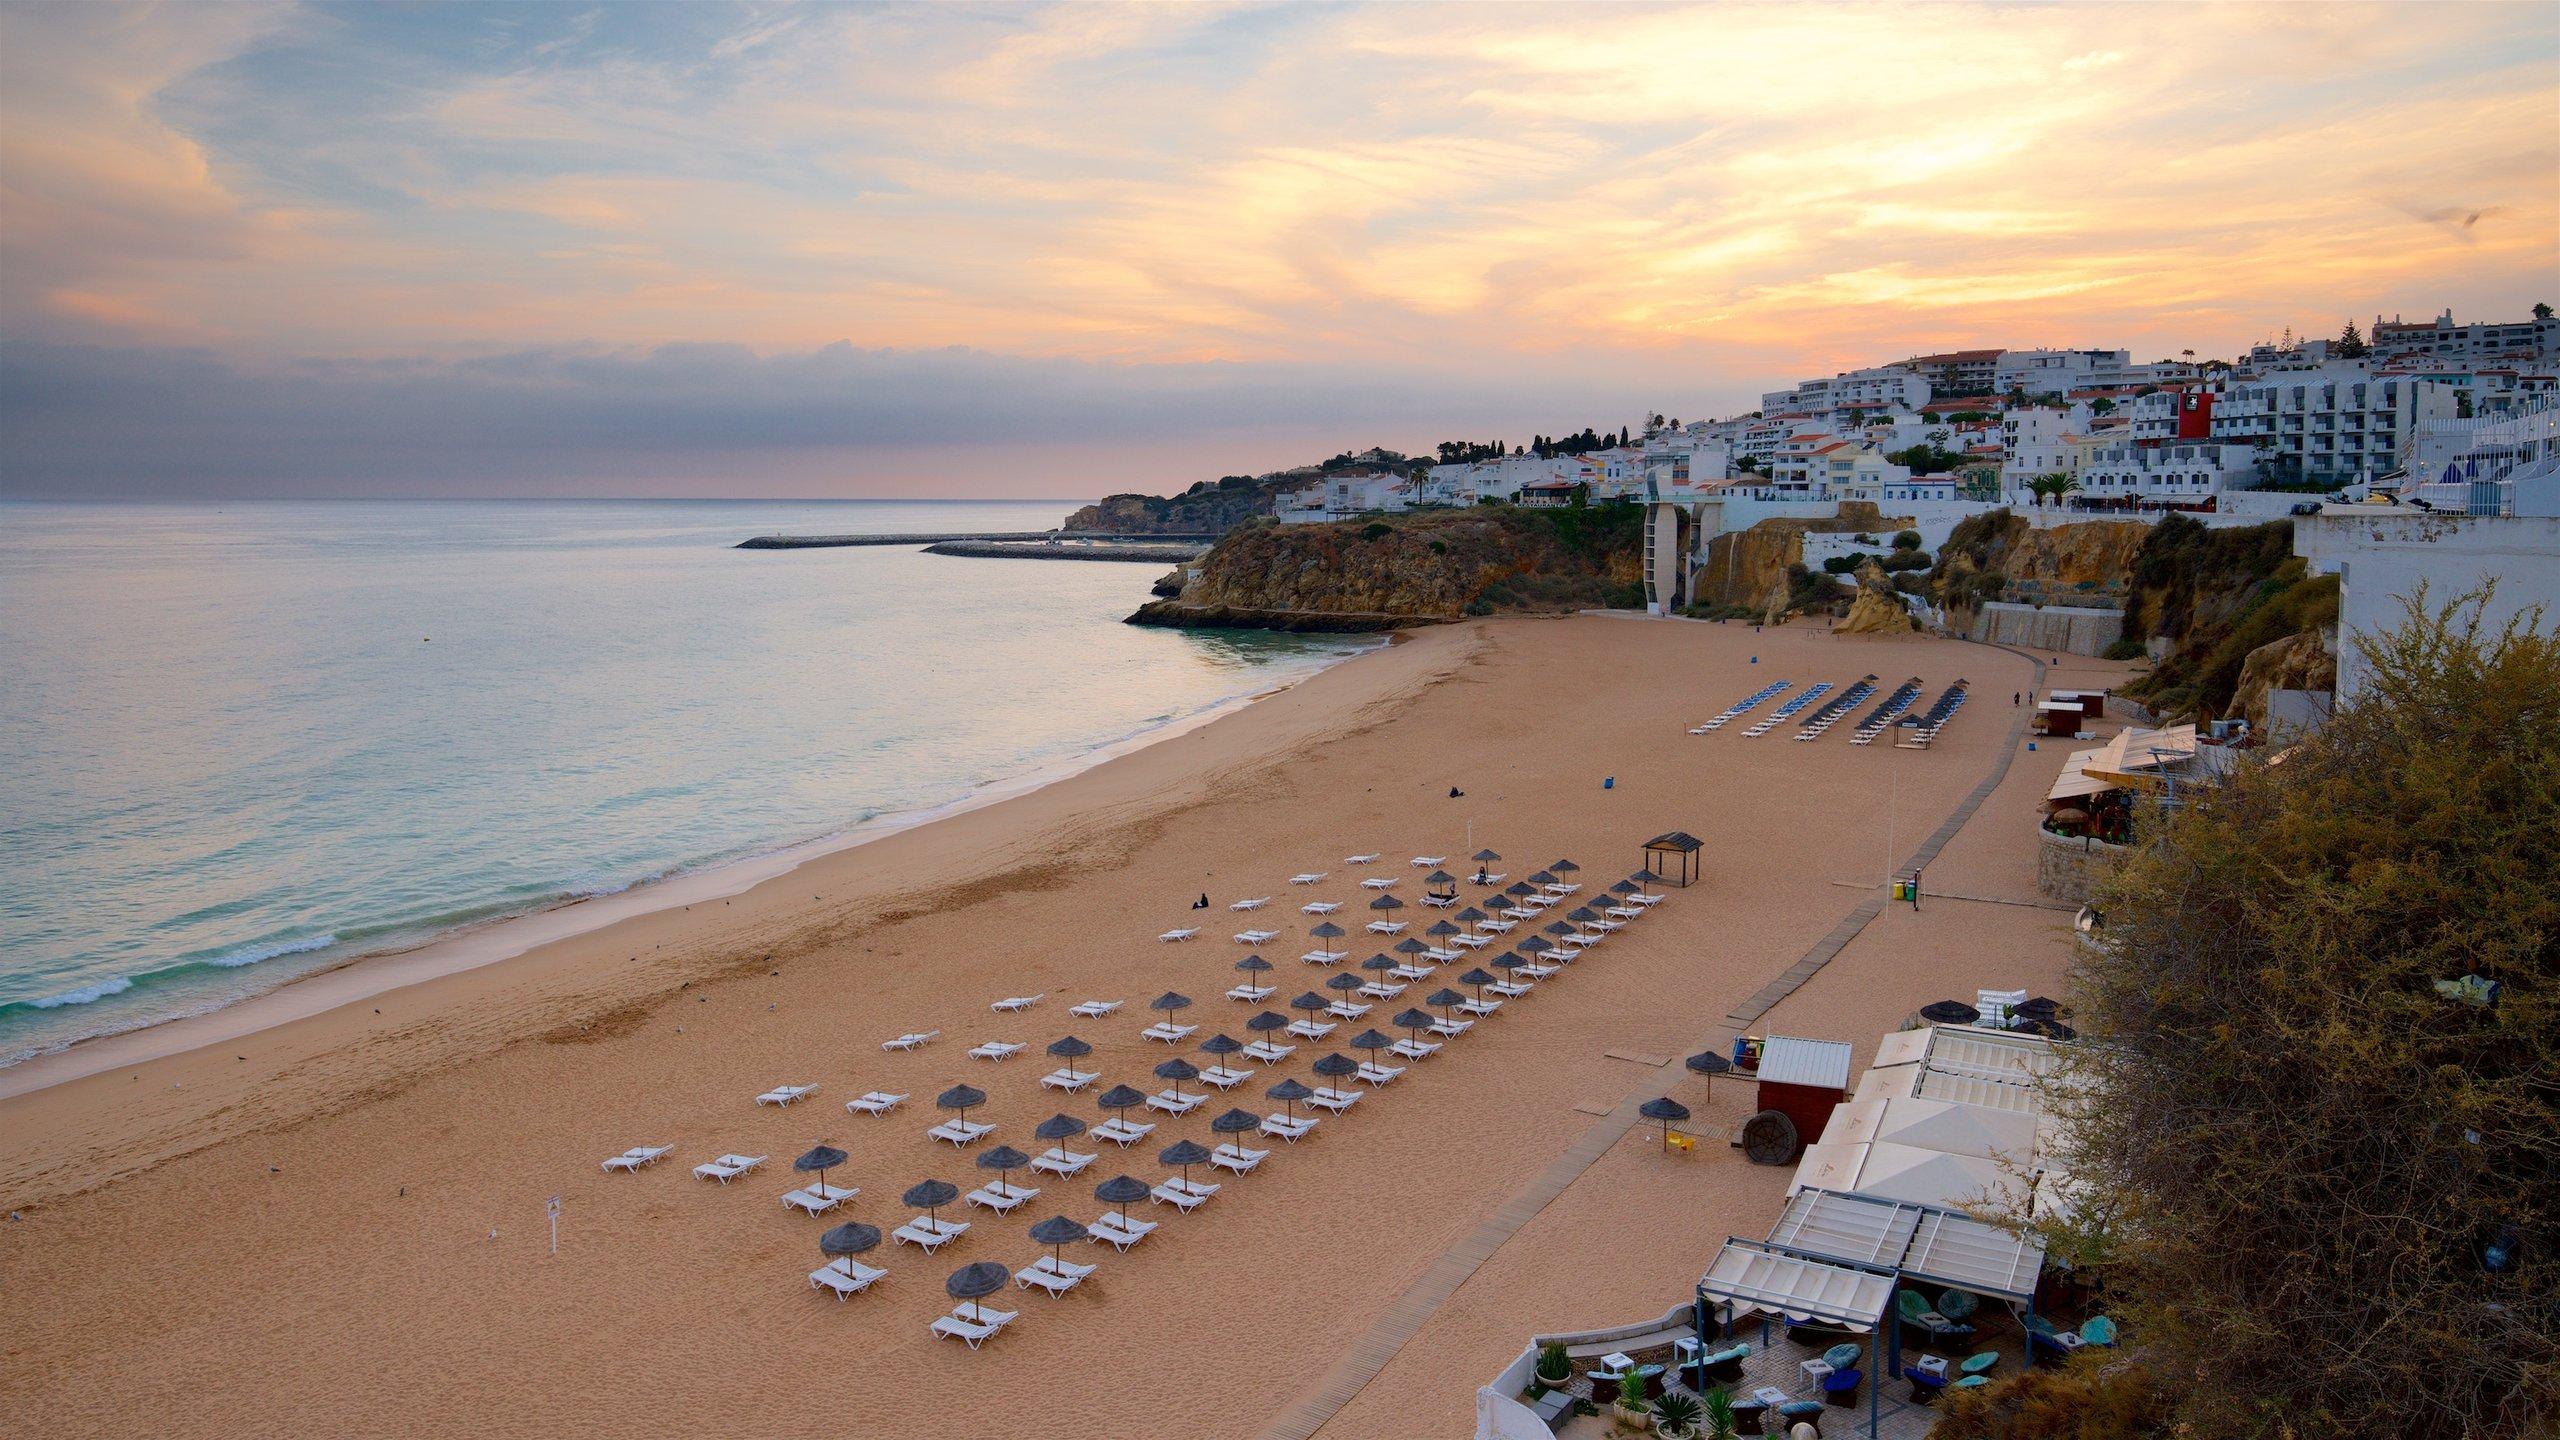 Fisherman's Beach, Albufeira, Portugal